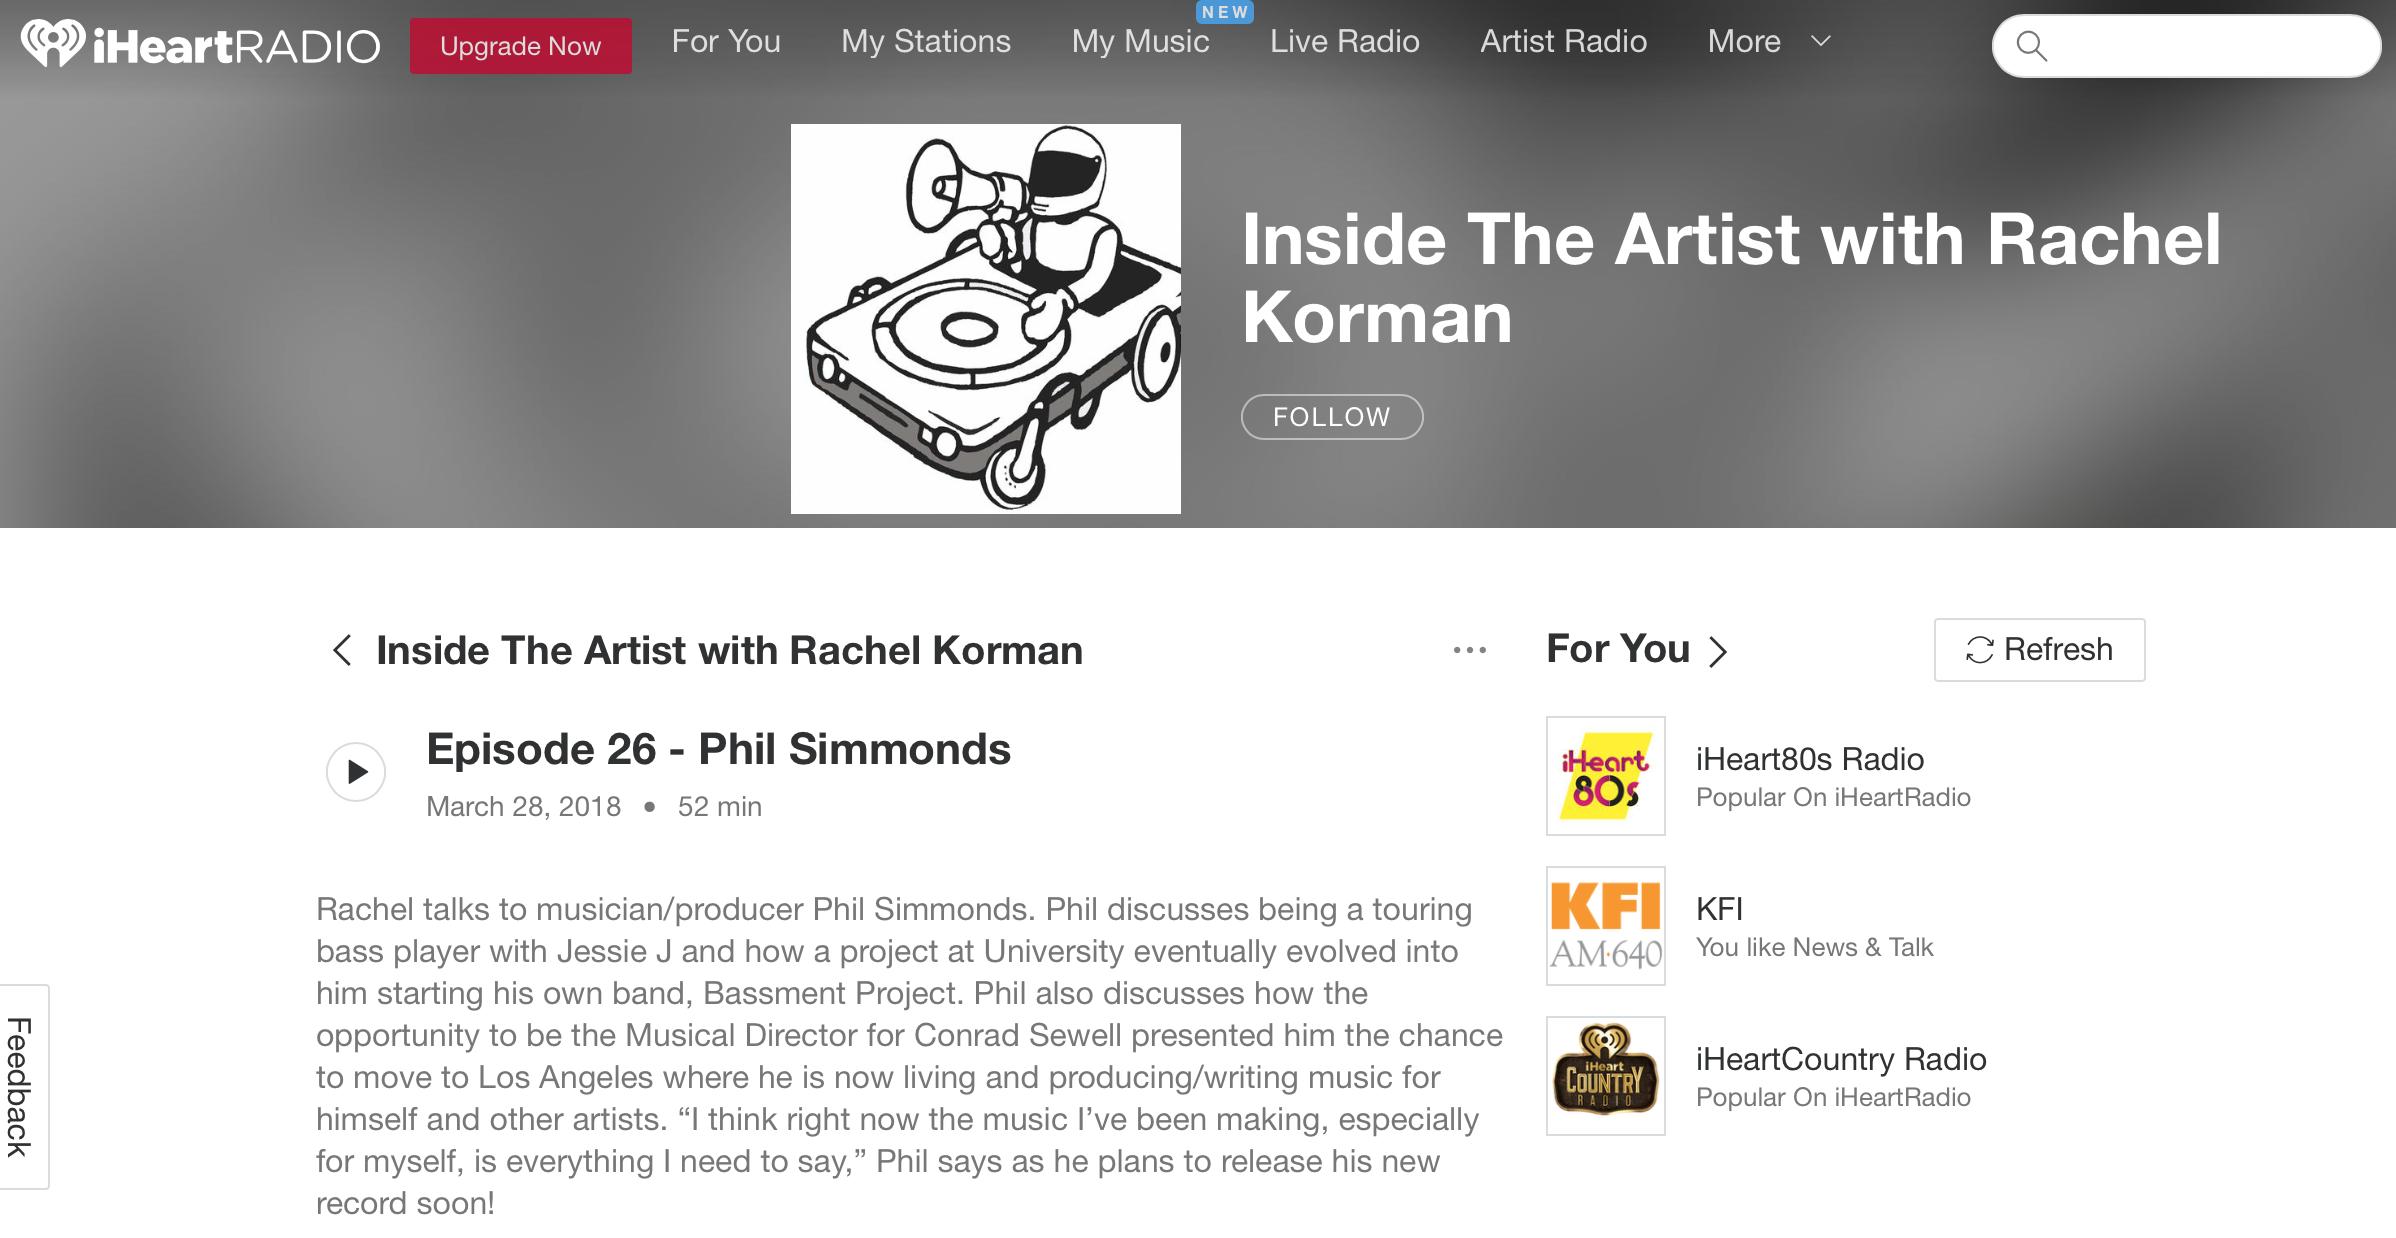 Inside The Artist: Interview - iHeart Media - Podcast w/ Rachel Korman